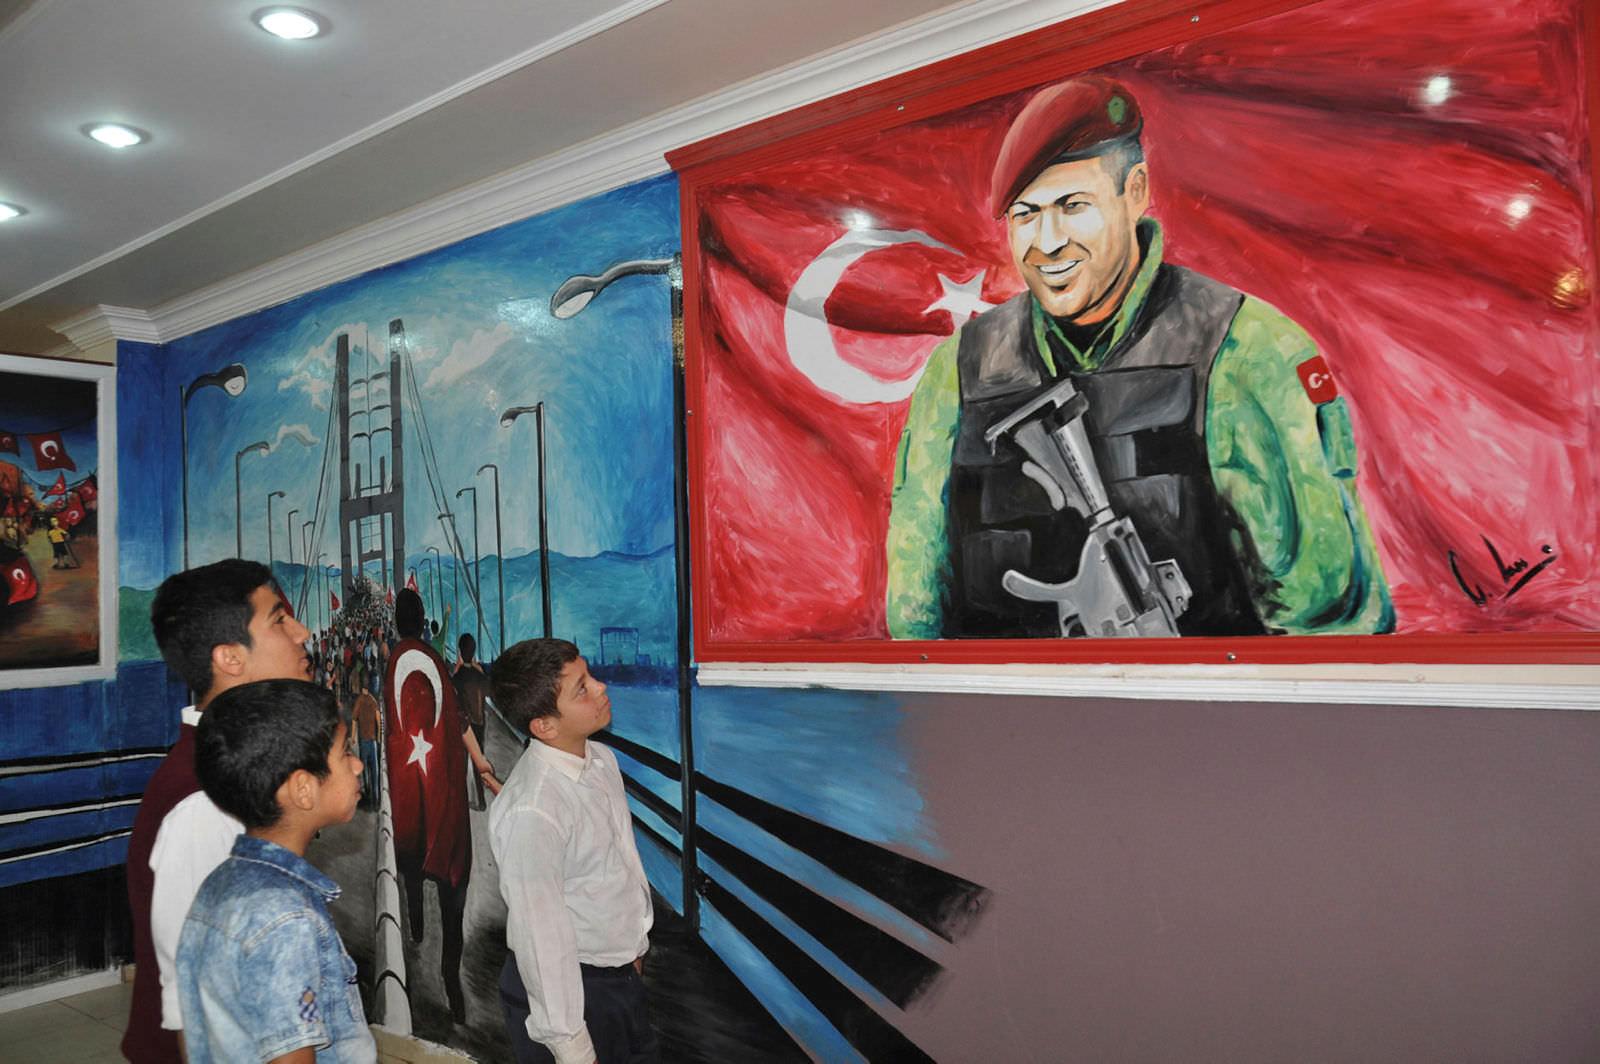 Resim Ogretmeni 15 Temmuz Kahramanlarini Okul Duvarina Resmetti